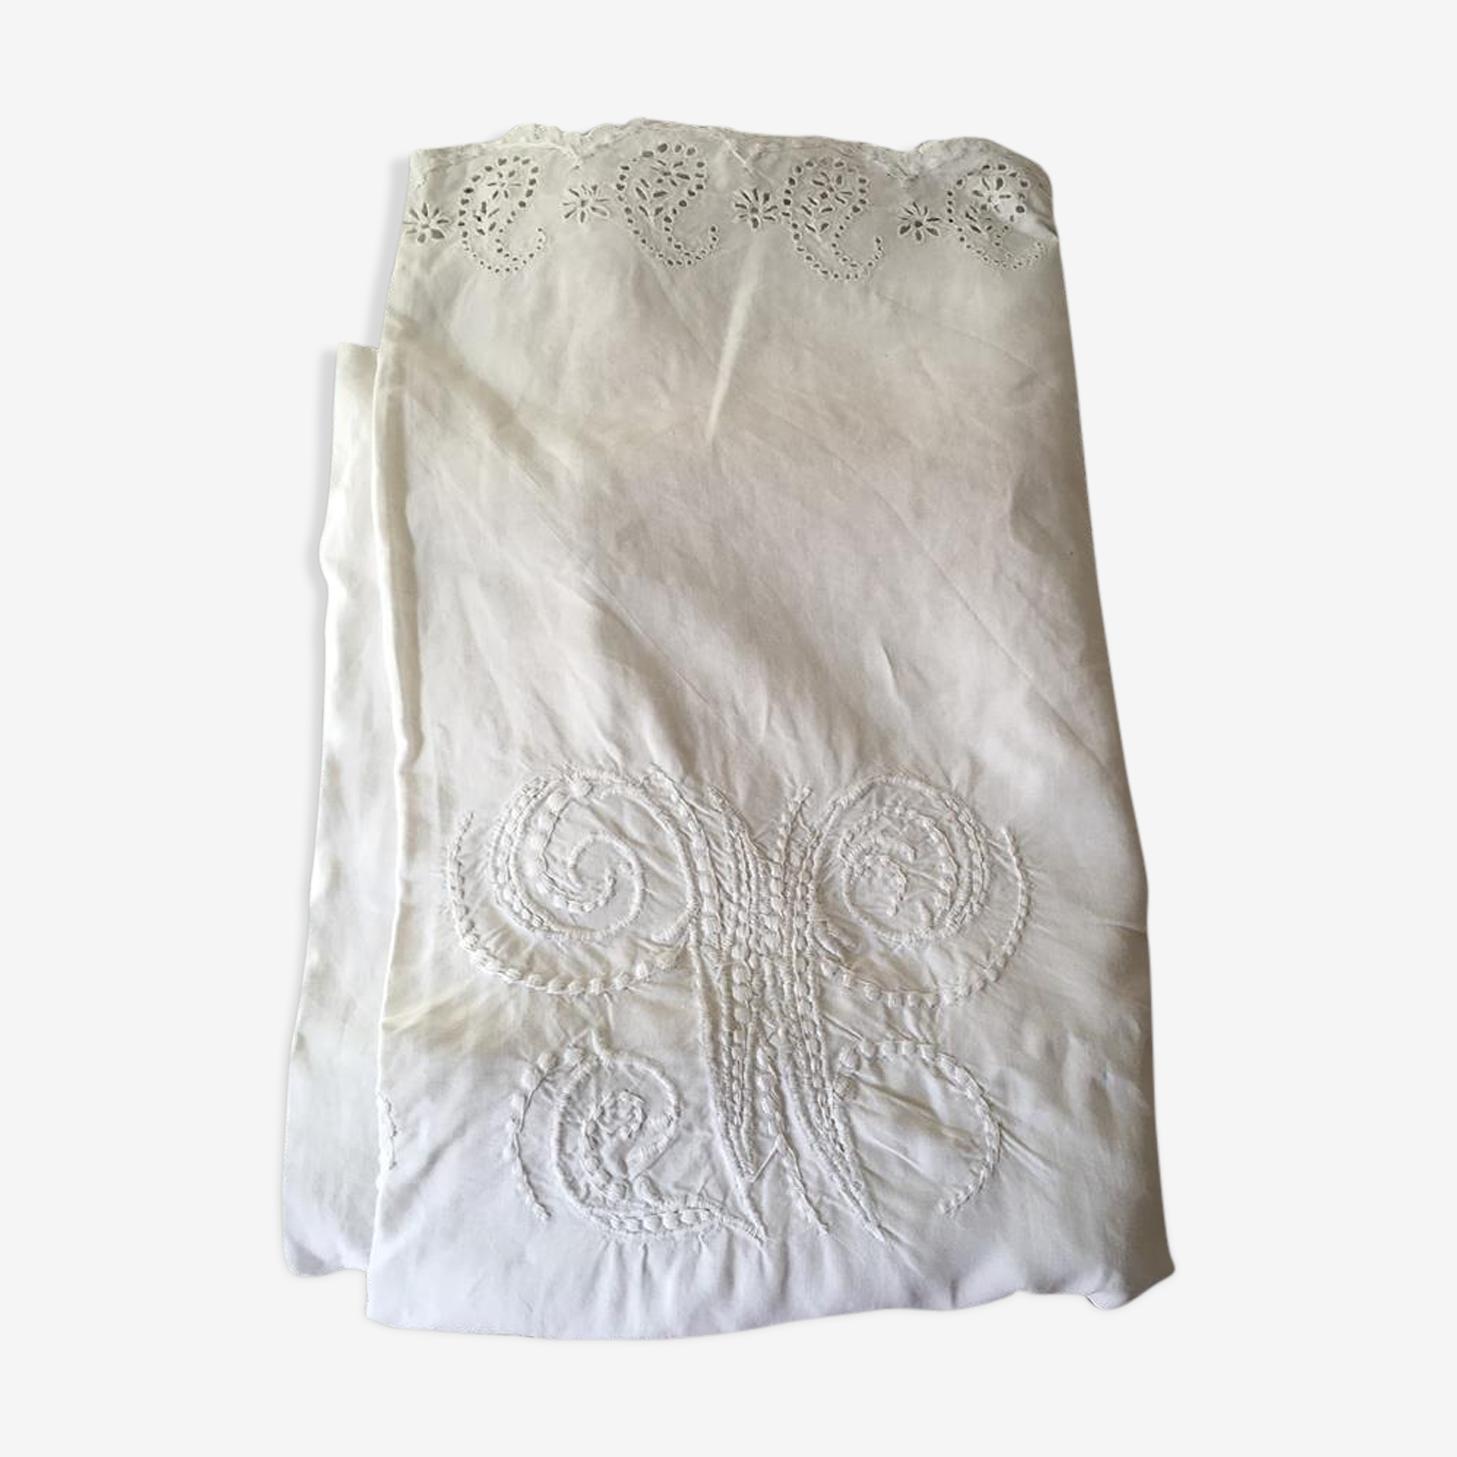 Old sheet in linen embroidered Monogram V M thread.